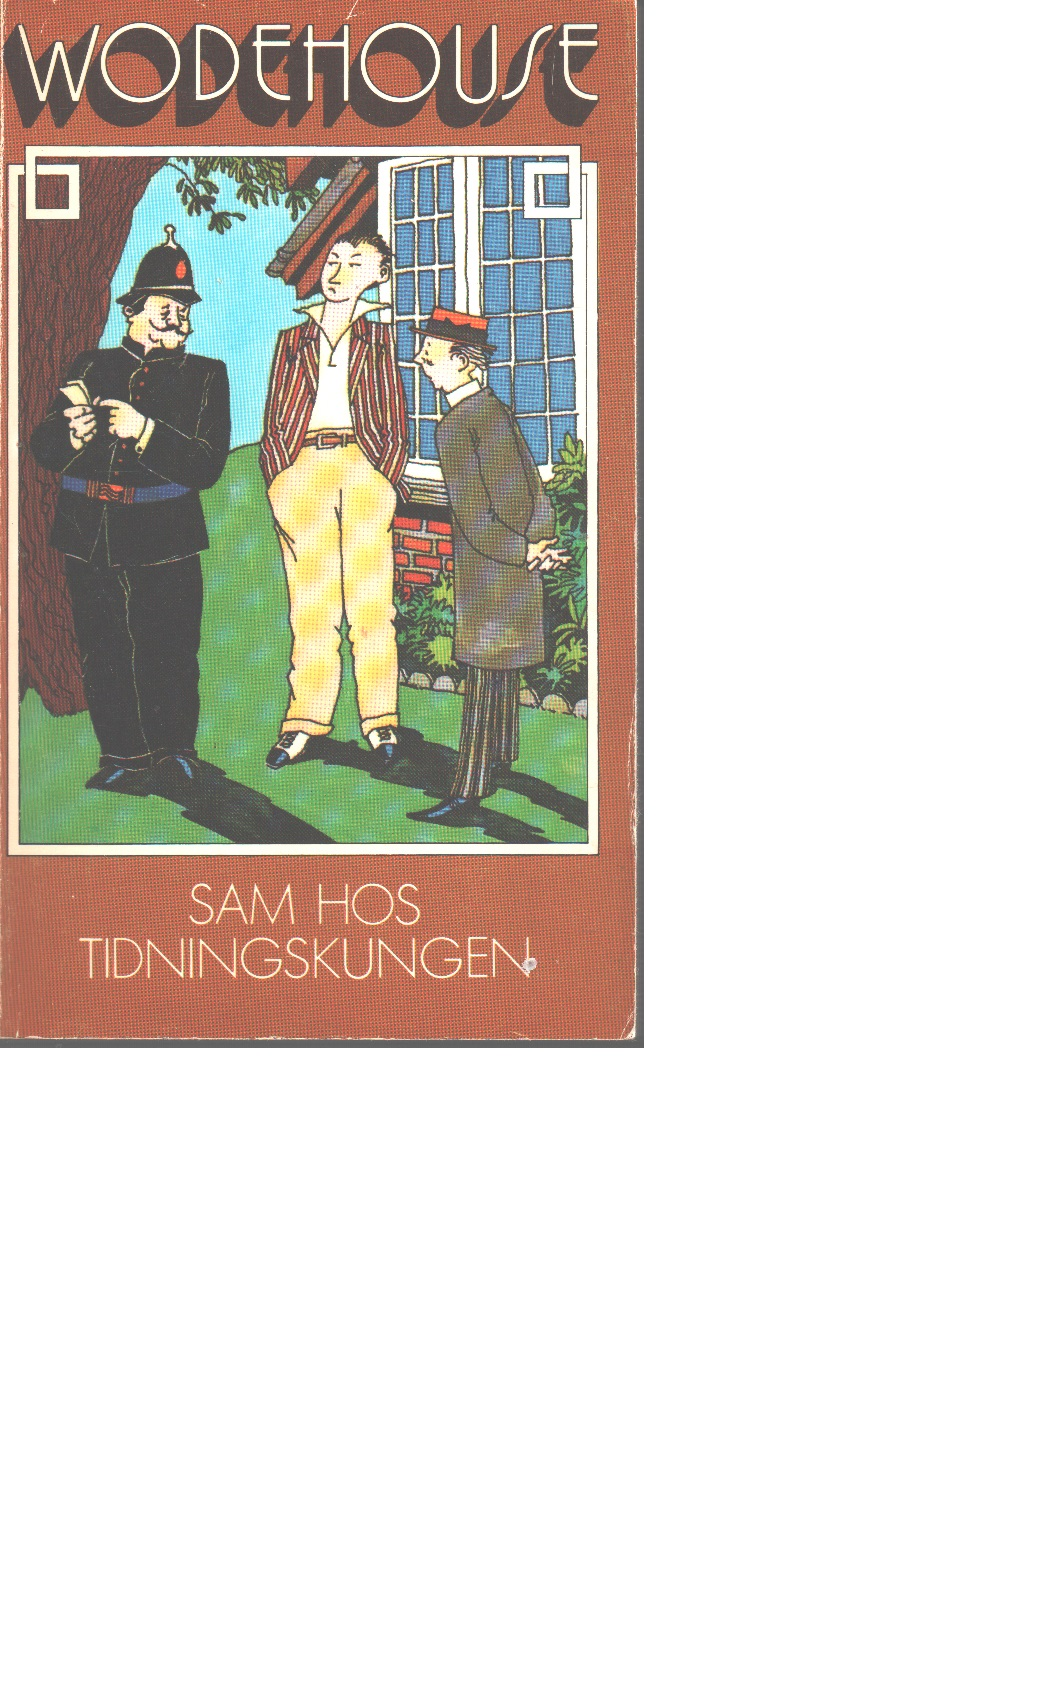 Sam hos tidningskungen - Wodehouse, P. G.